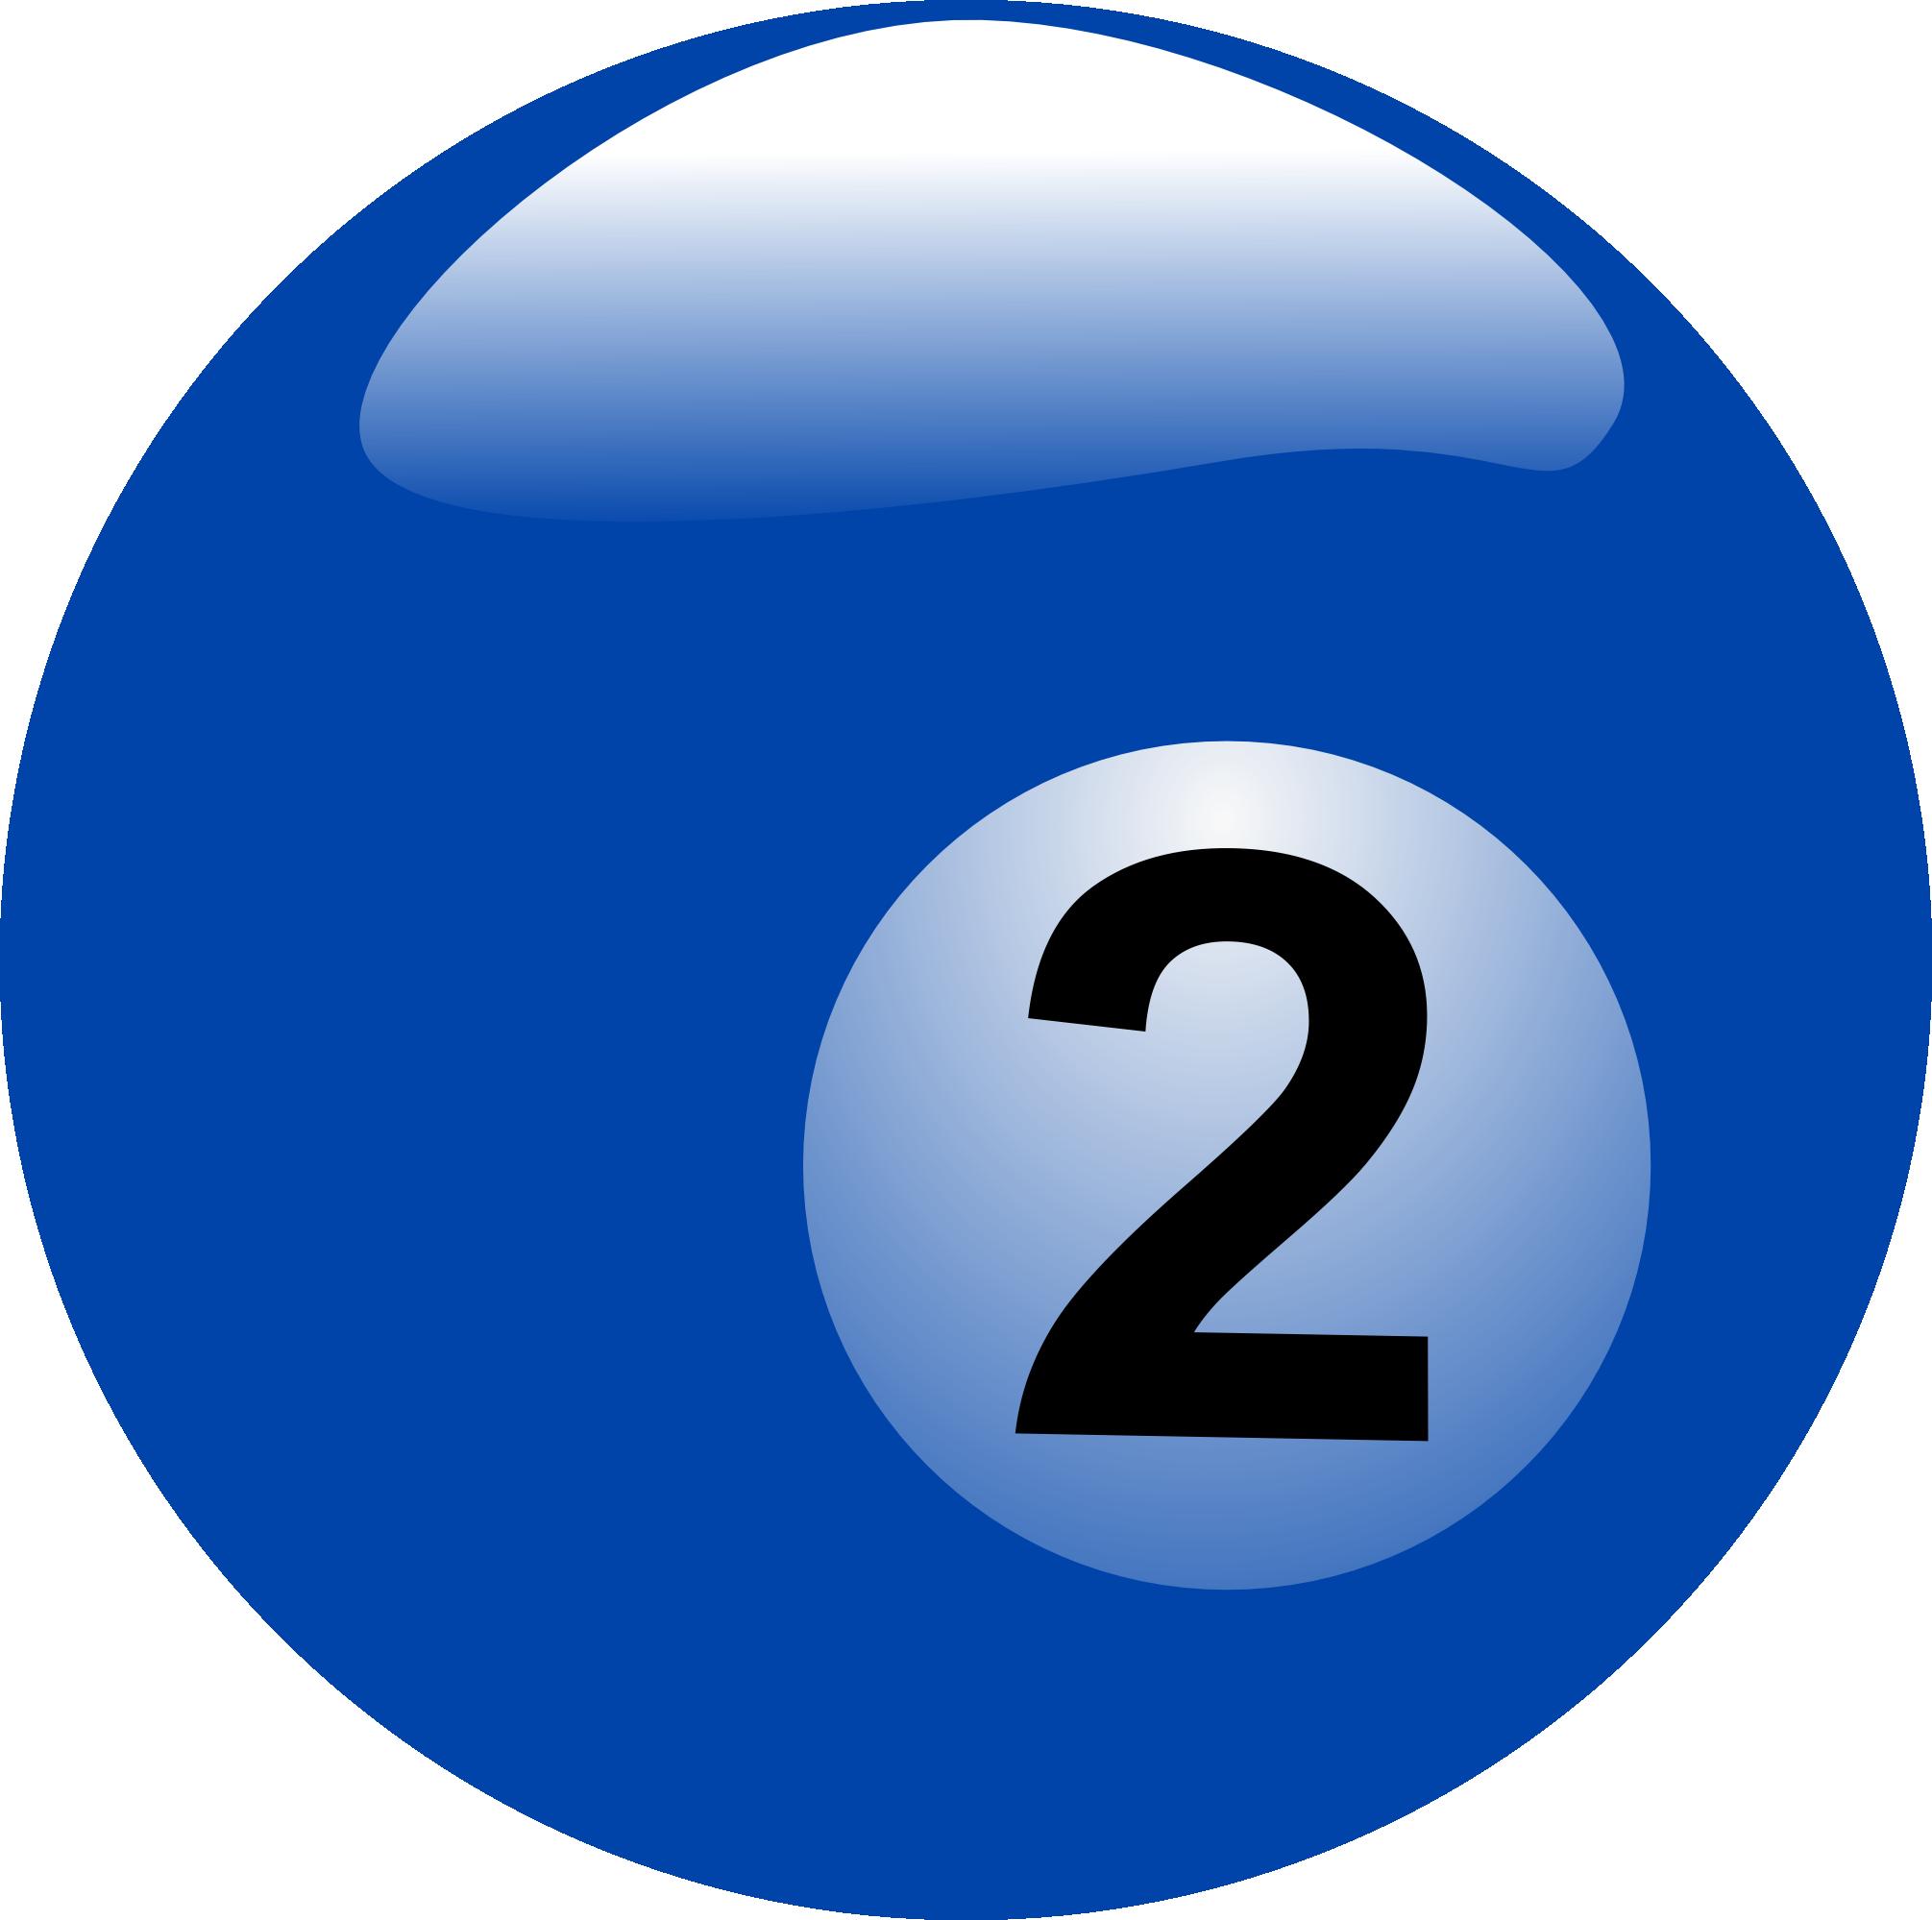 Billiard Ball Number 2 Free Image